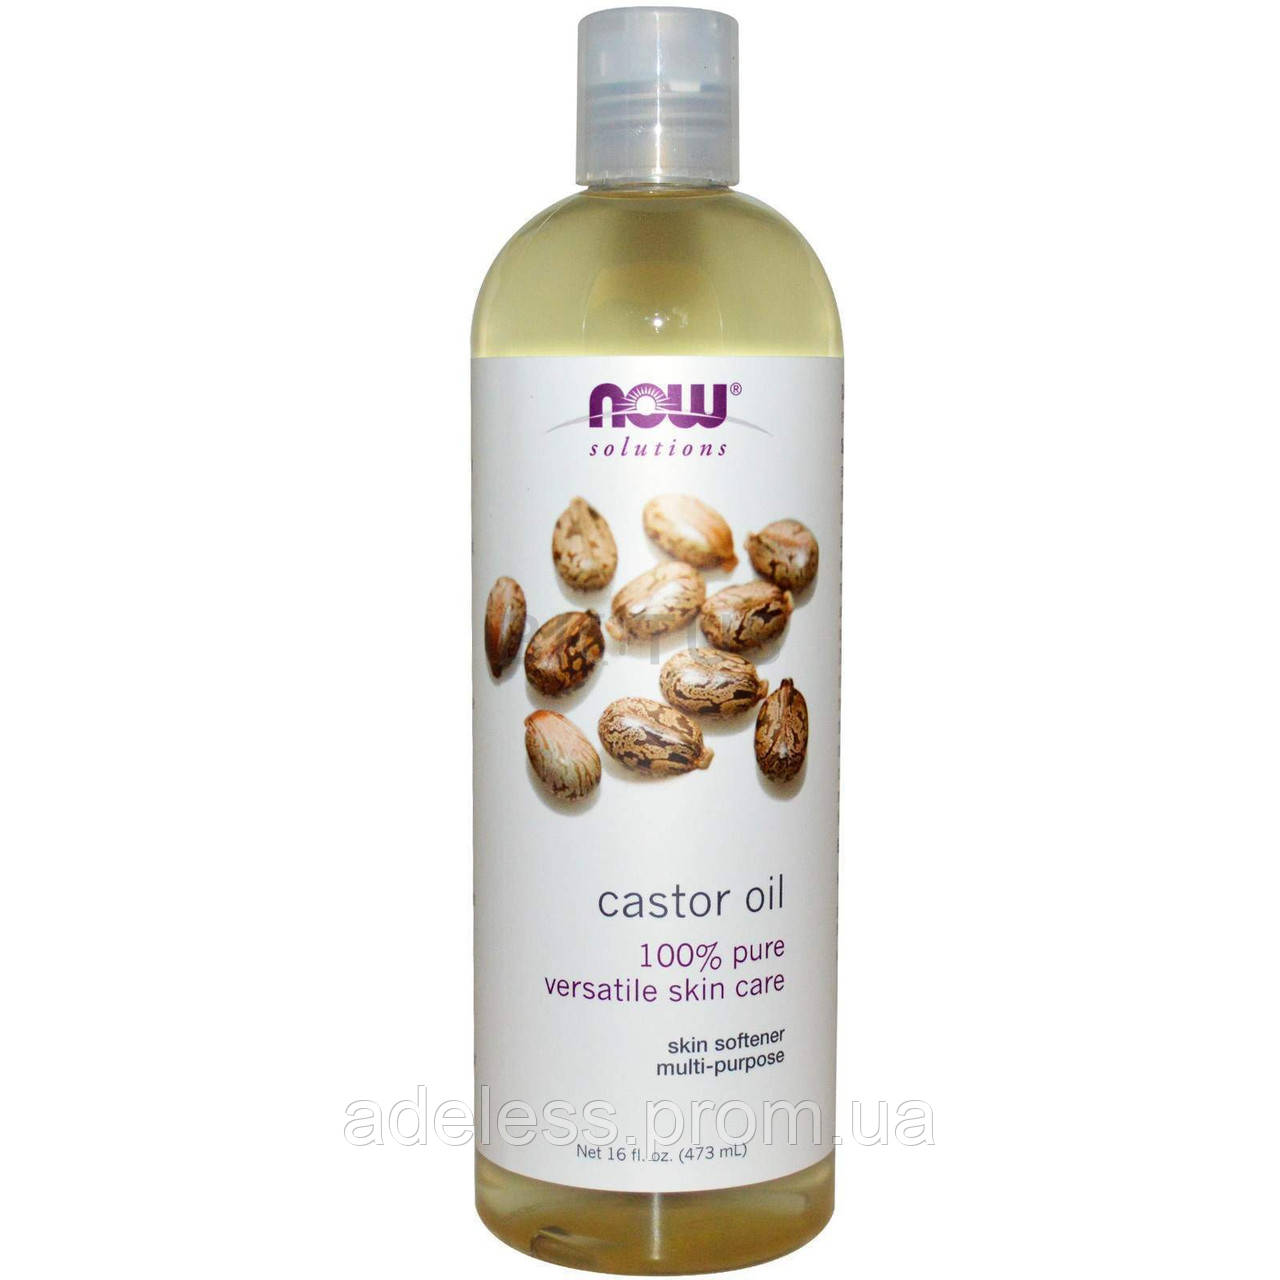 Касторовое масло NOW Foods Castor Oil 100% pure, 473 мл.